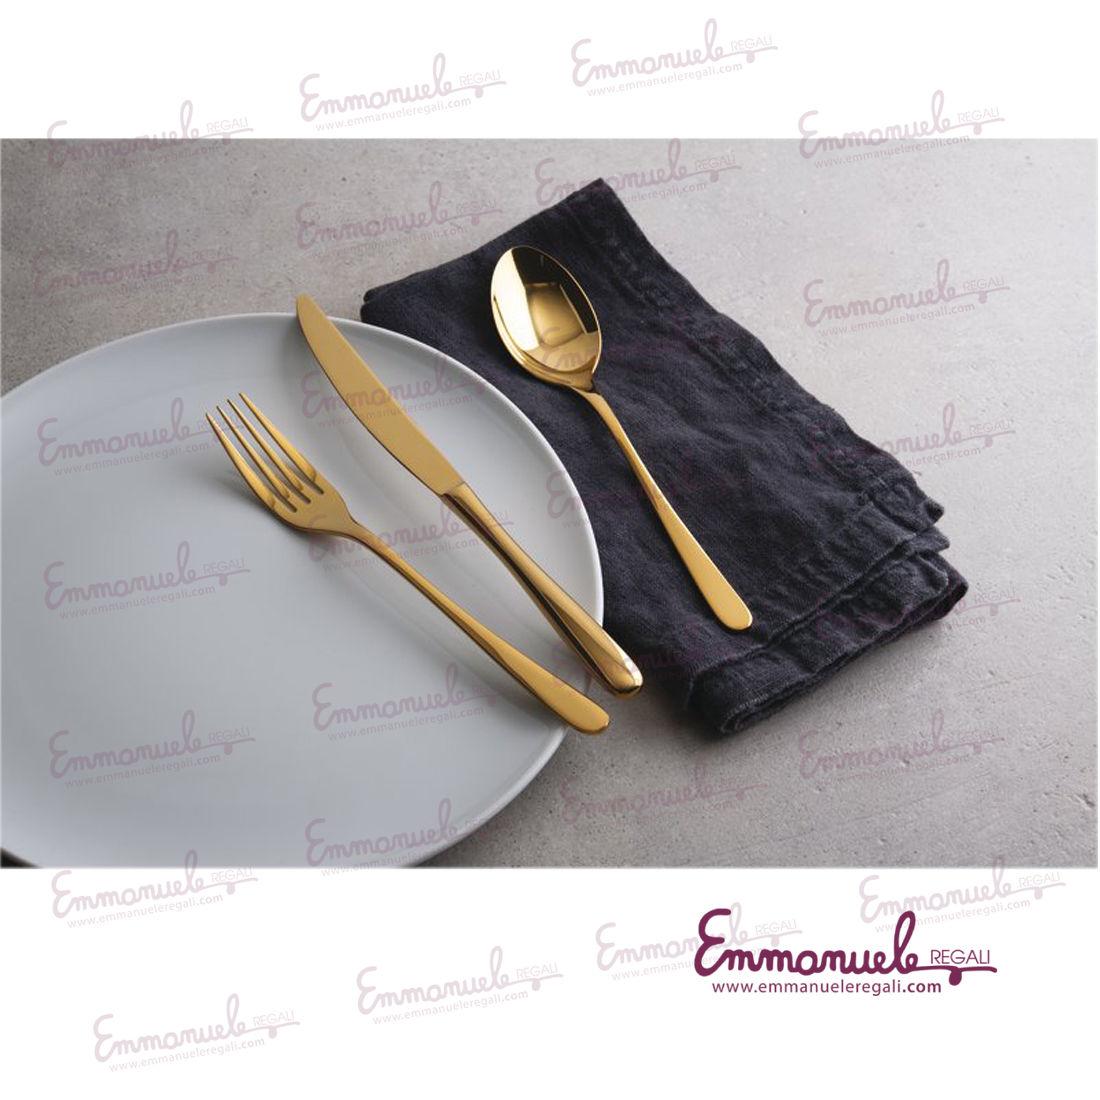 servizio_posate_taste_gold_24_pz_sambonet_emmanueleregali_bombonieraperfetta